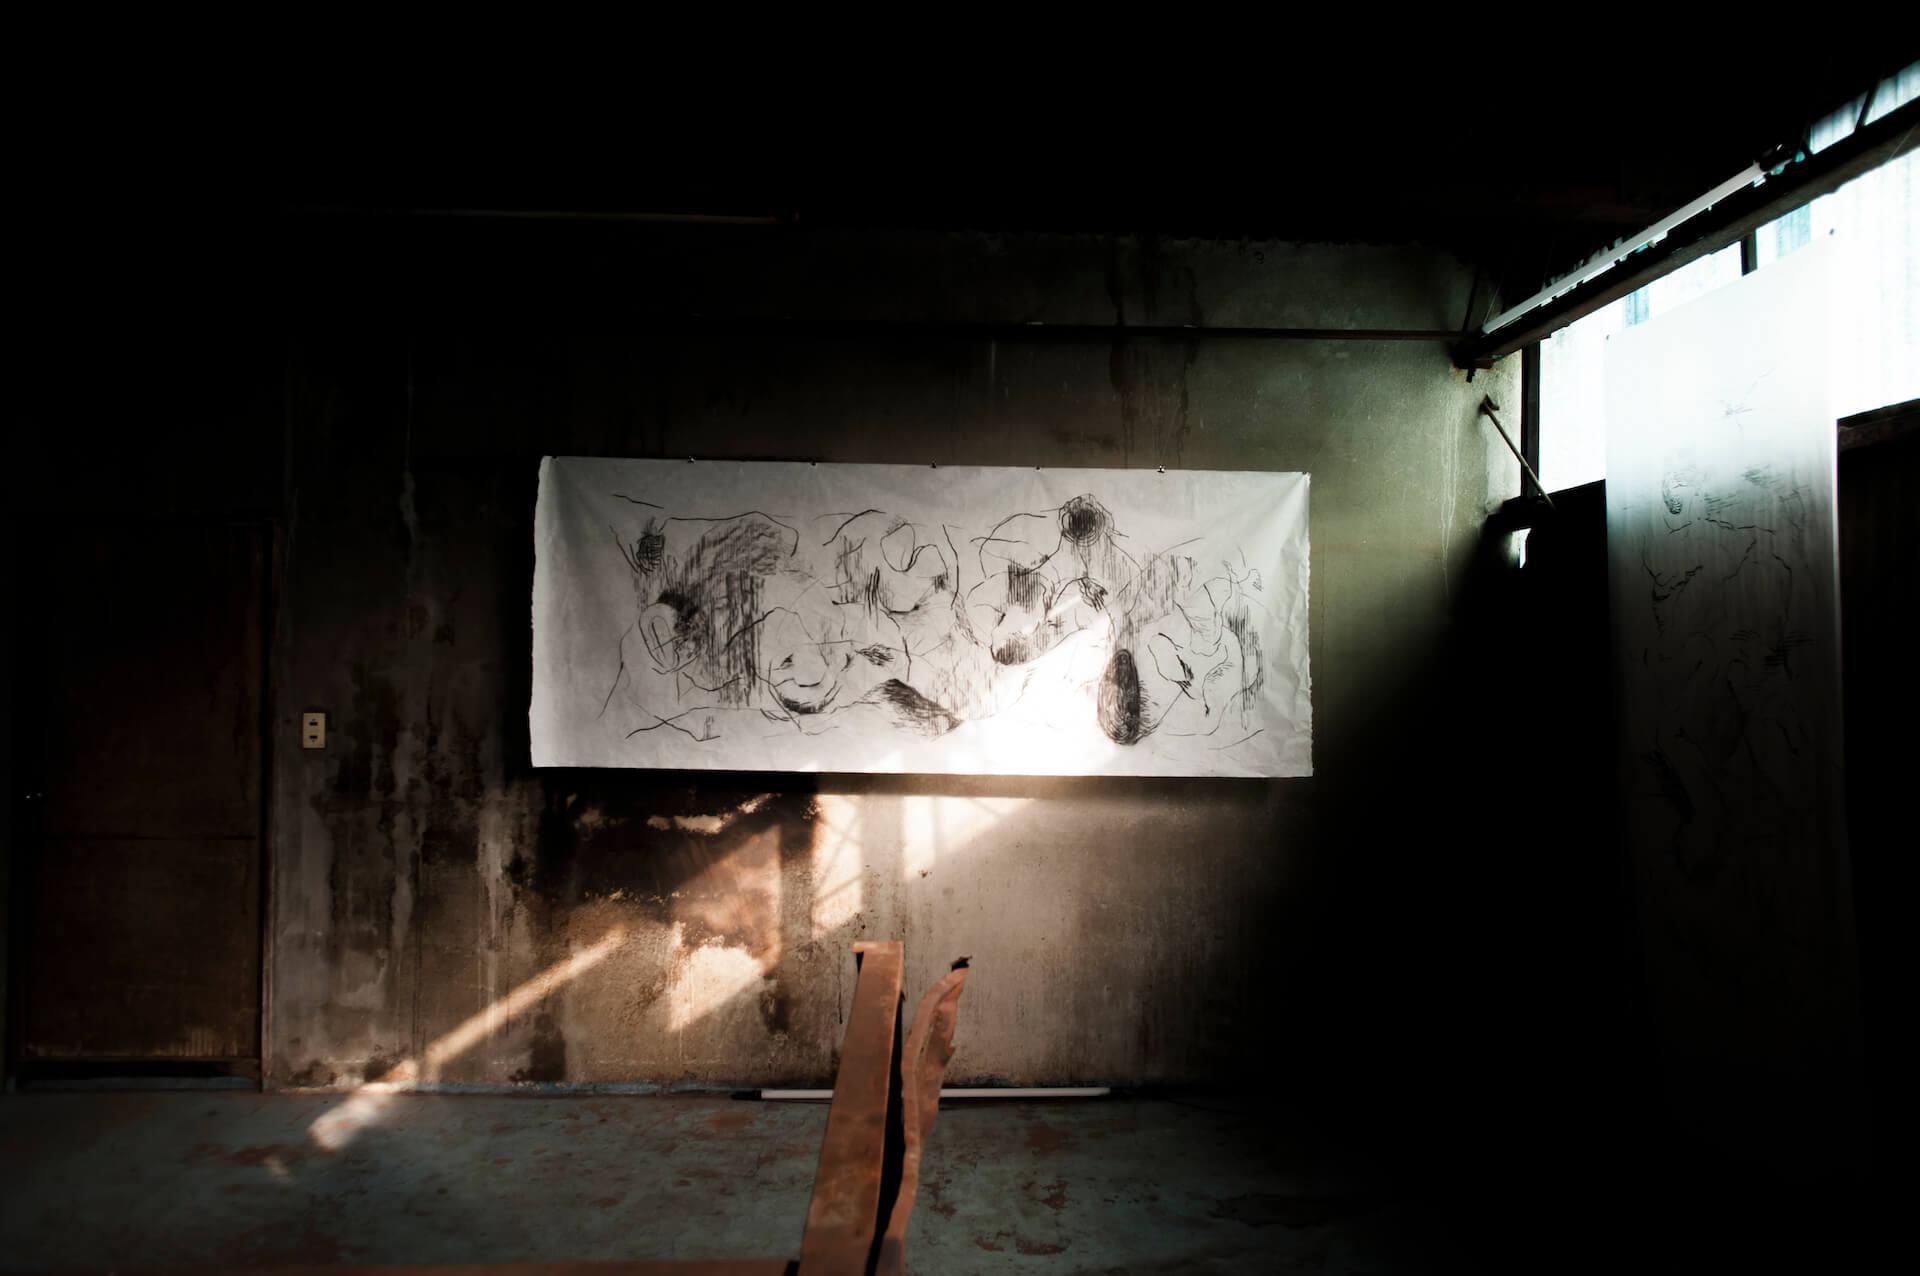 UC EASTの東京初個展「MOTHER」がANAGRAにて開催 オープニングパーティには¥ØU$UK€ ¥UK1MAT$U、Akie、Celterが出演 art-culture201202-uceast-anagra-5